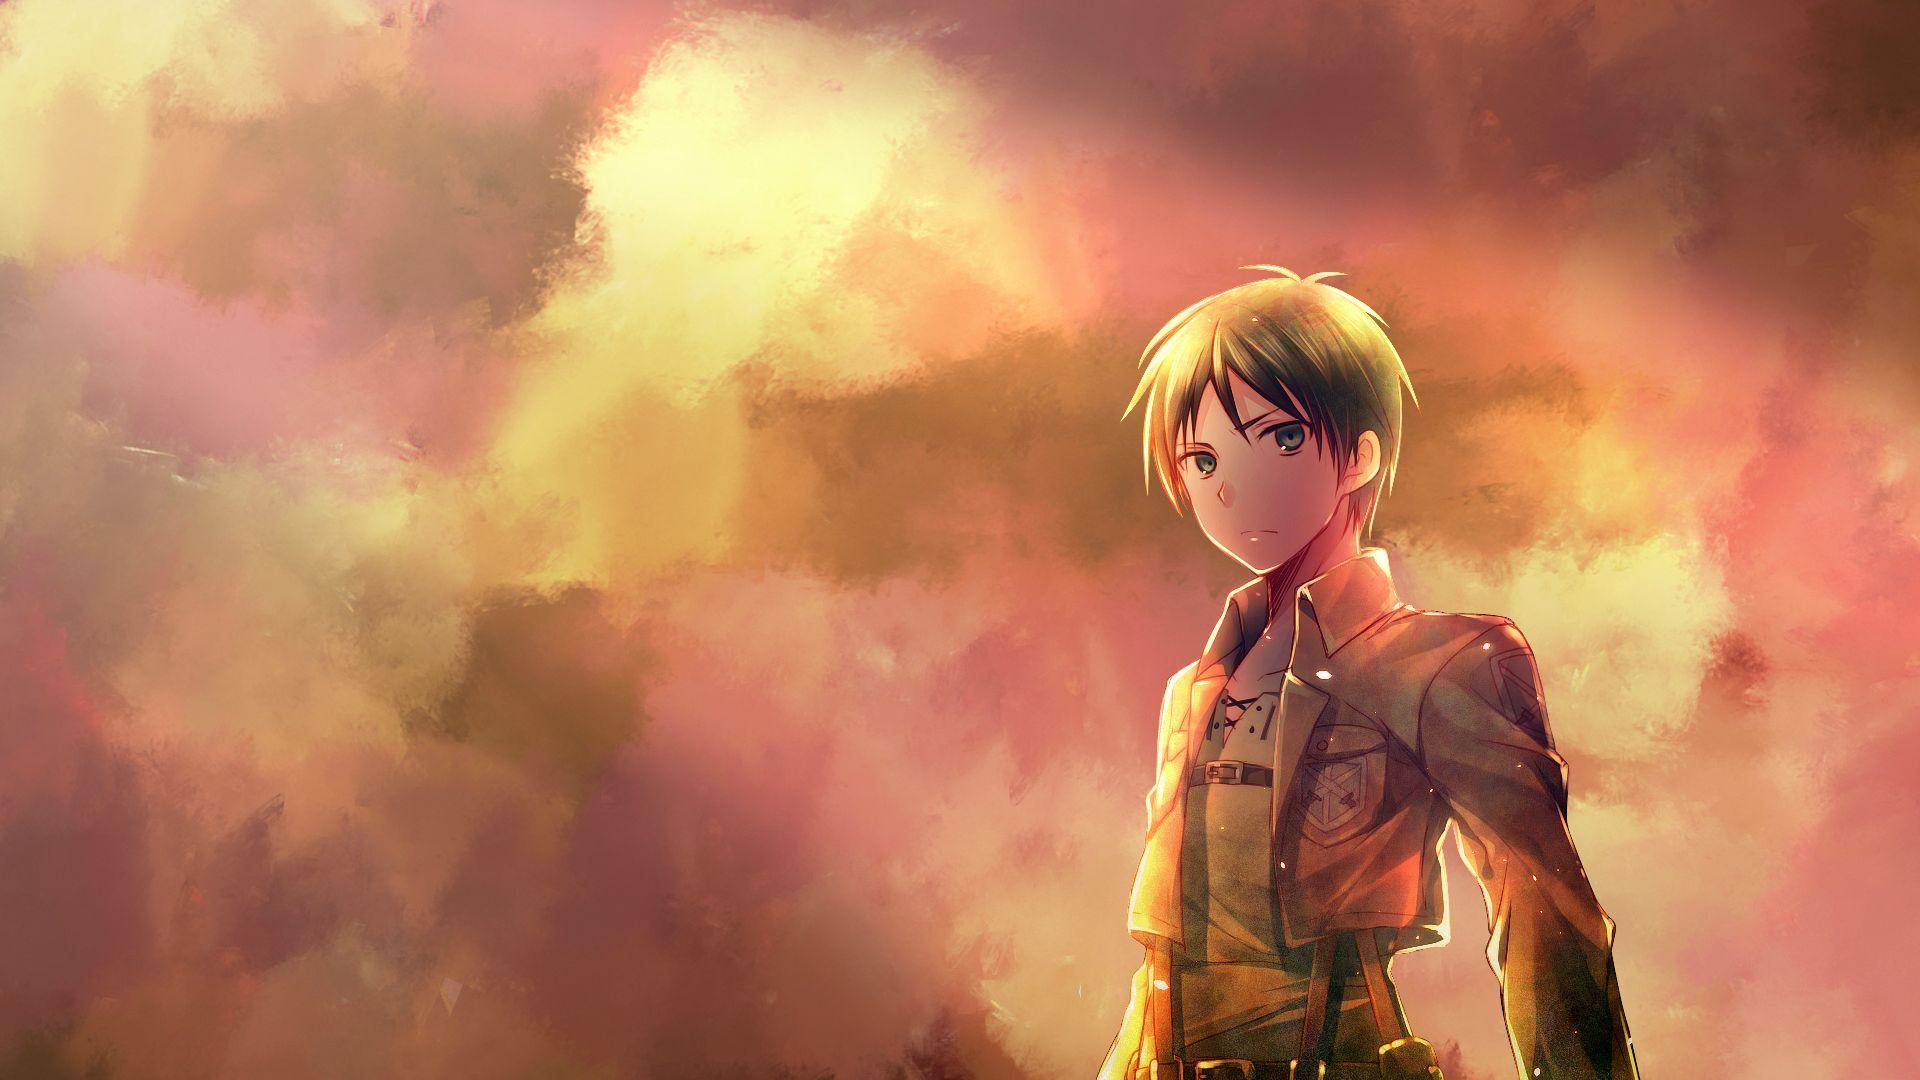 Shingeki No Kyojin Eren Jager Hd Wallpaper Background Image 1920x1080 Id 607896 Wallpaper Abyss